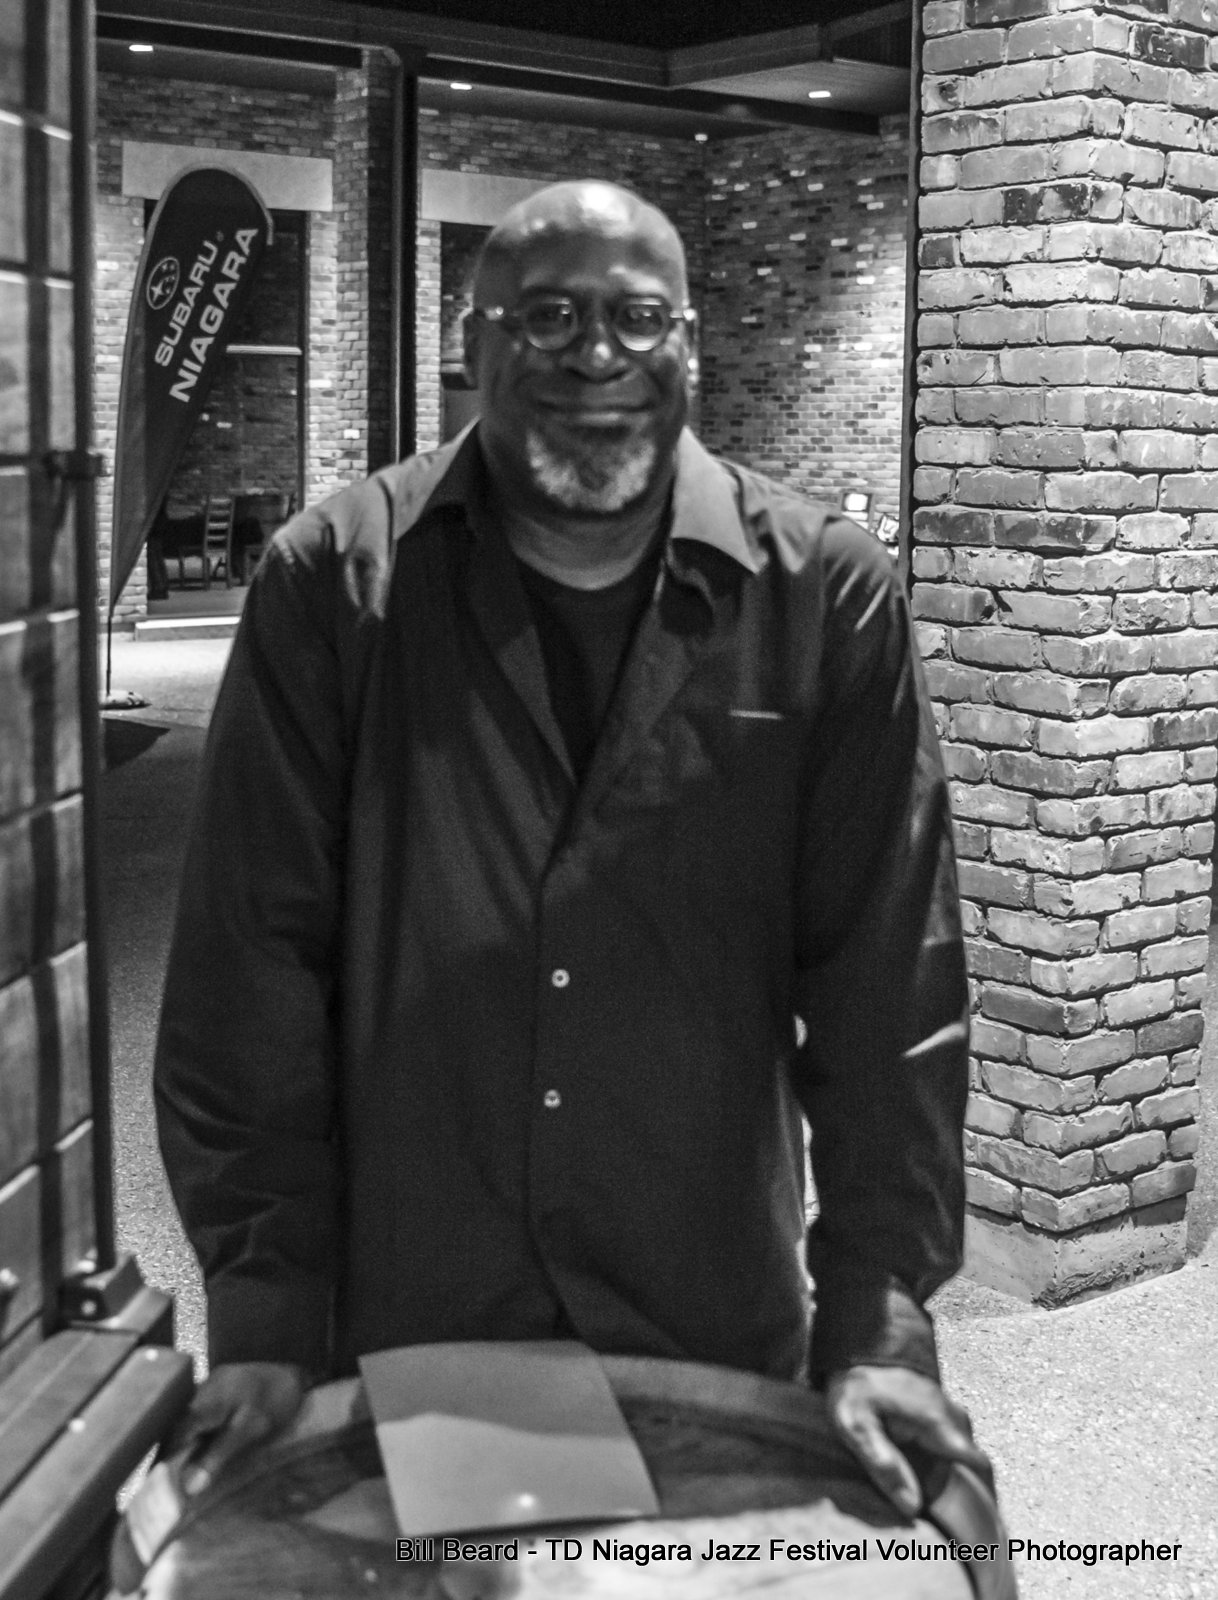 SOUL JAZZ in the VINEYARD - The Hare Wine Co. - Emcee: Jazz FM 91.1's John Devenish - Saturday, July 29th, 2017. Photo: Dan Brown